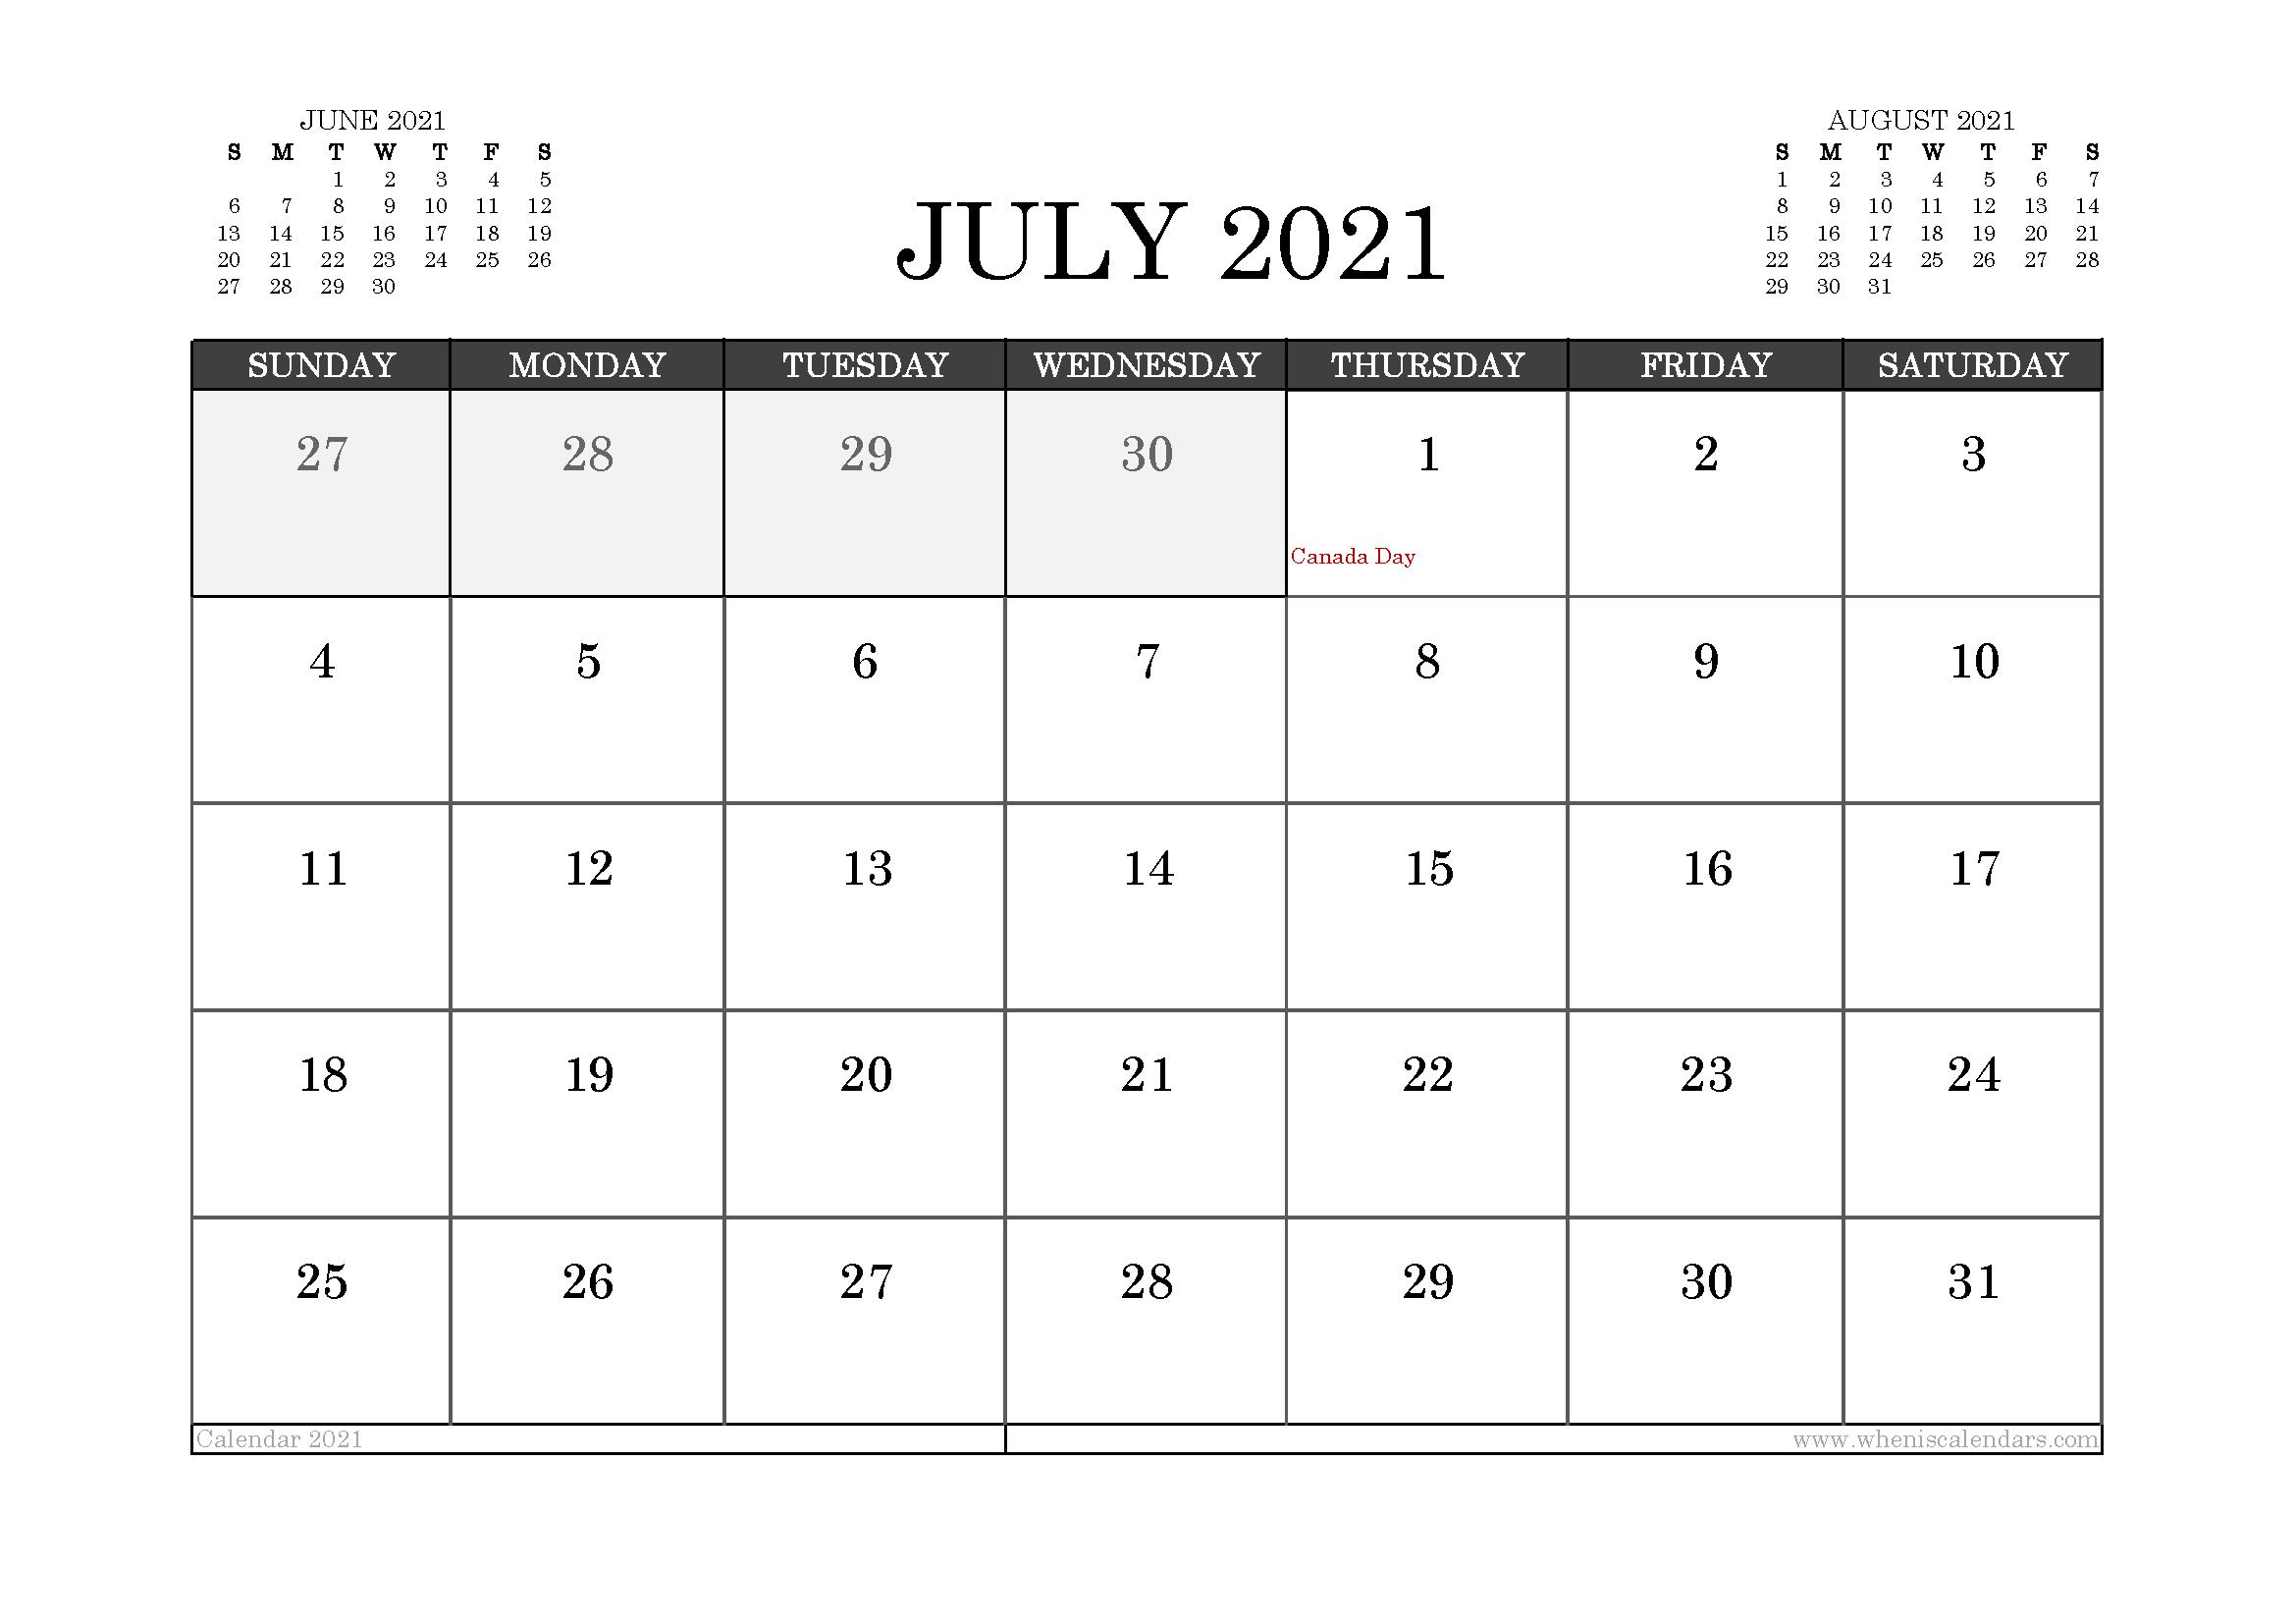 July 2021 Calendar Canada with Holidays